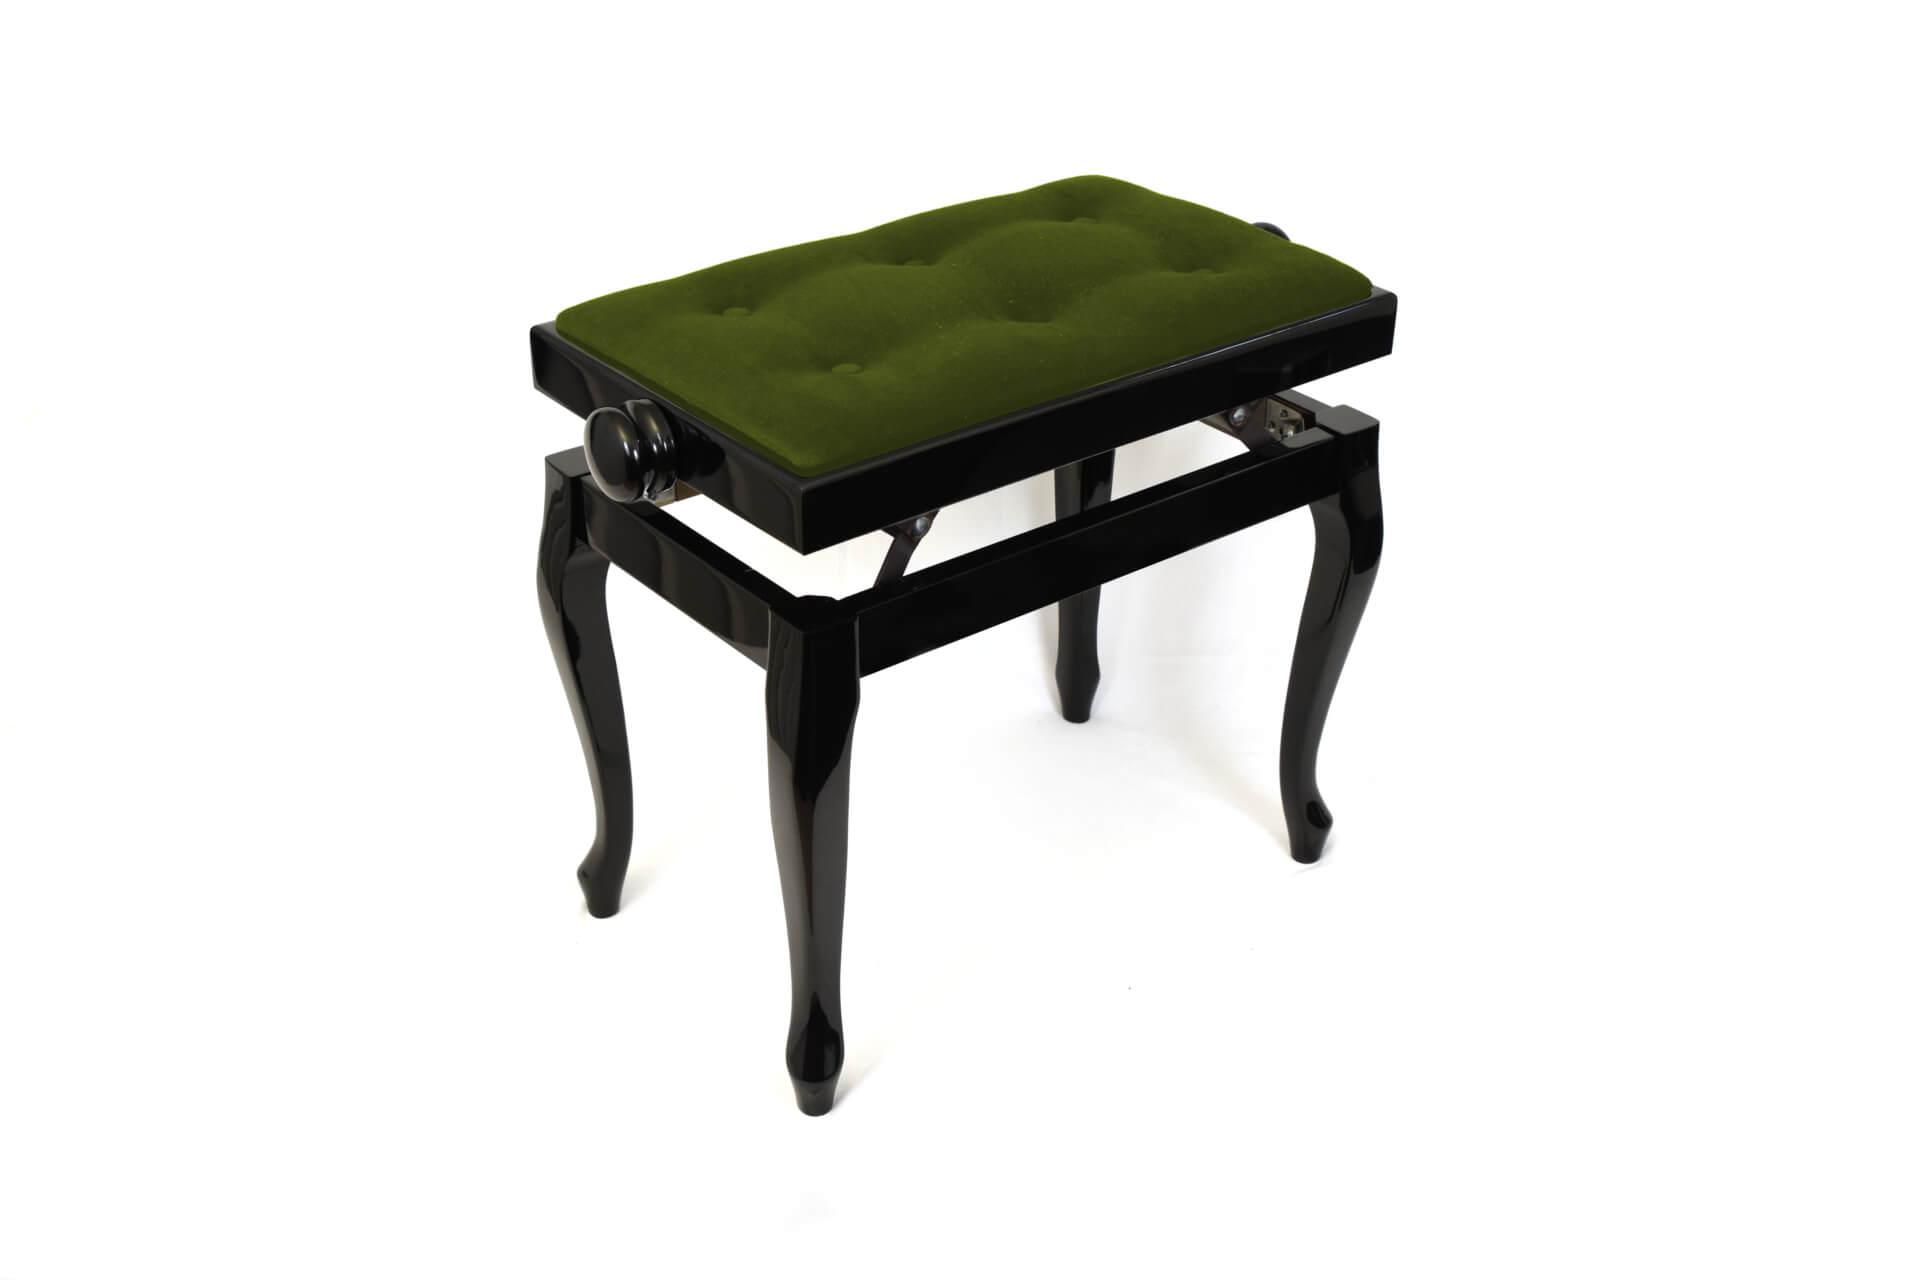 tabouret de piano vivaldi velours vert. Black Bedroom Furniture Sets. Home Design Ideas